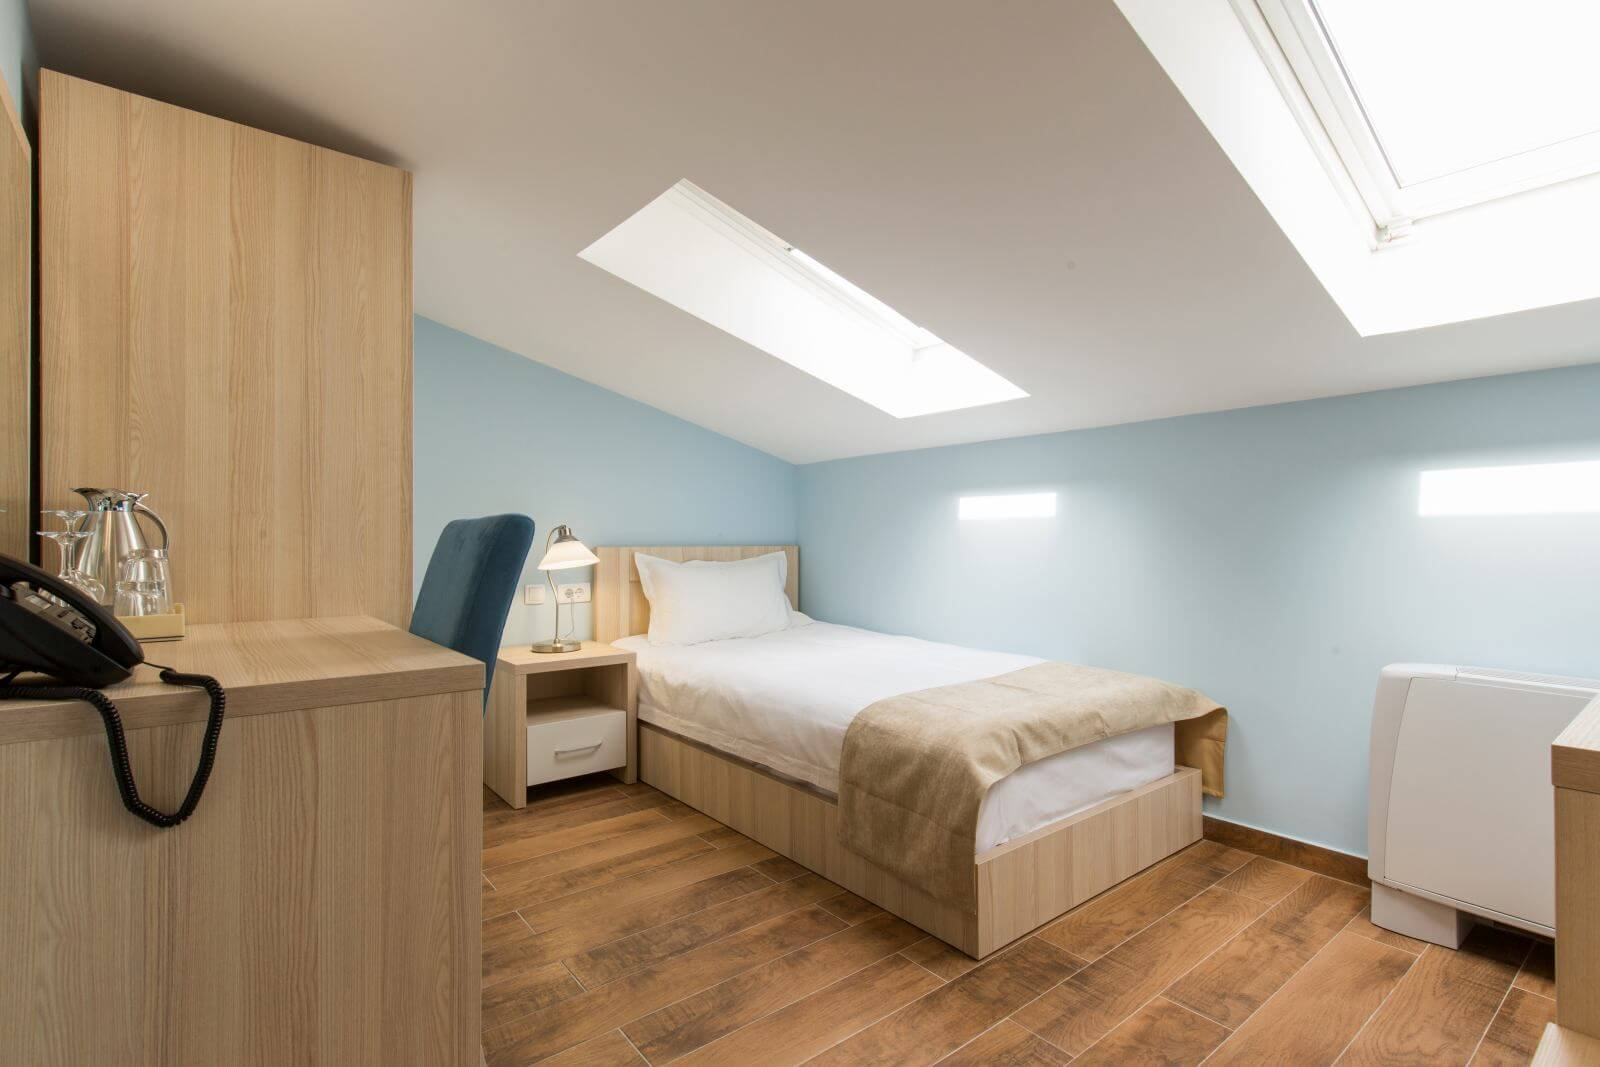 Interior of a bedroom in loft apartment